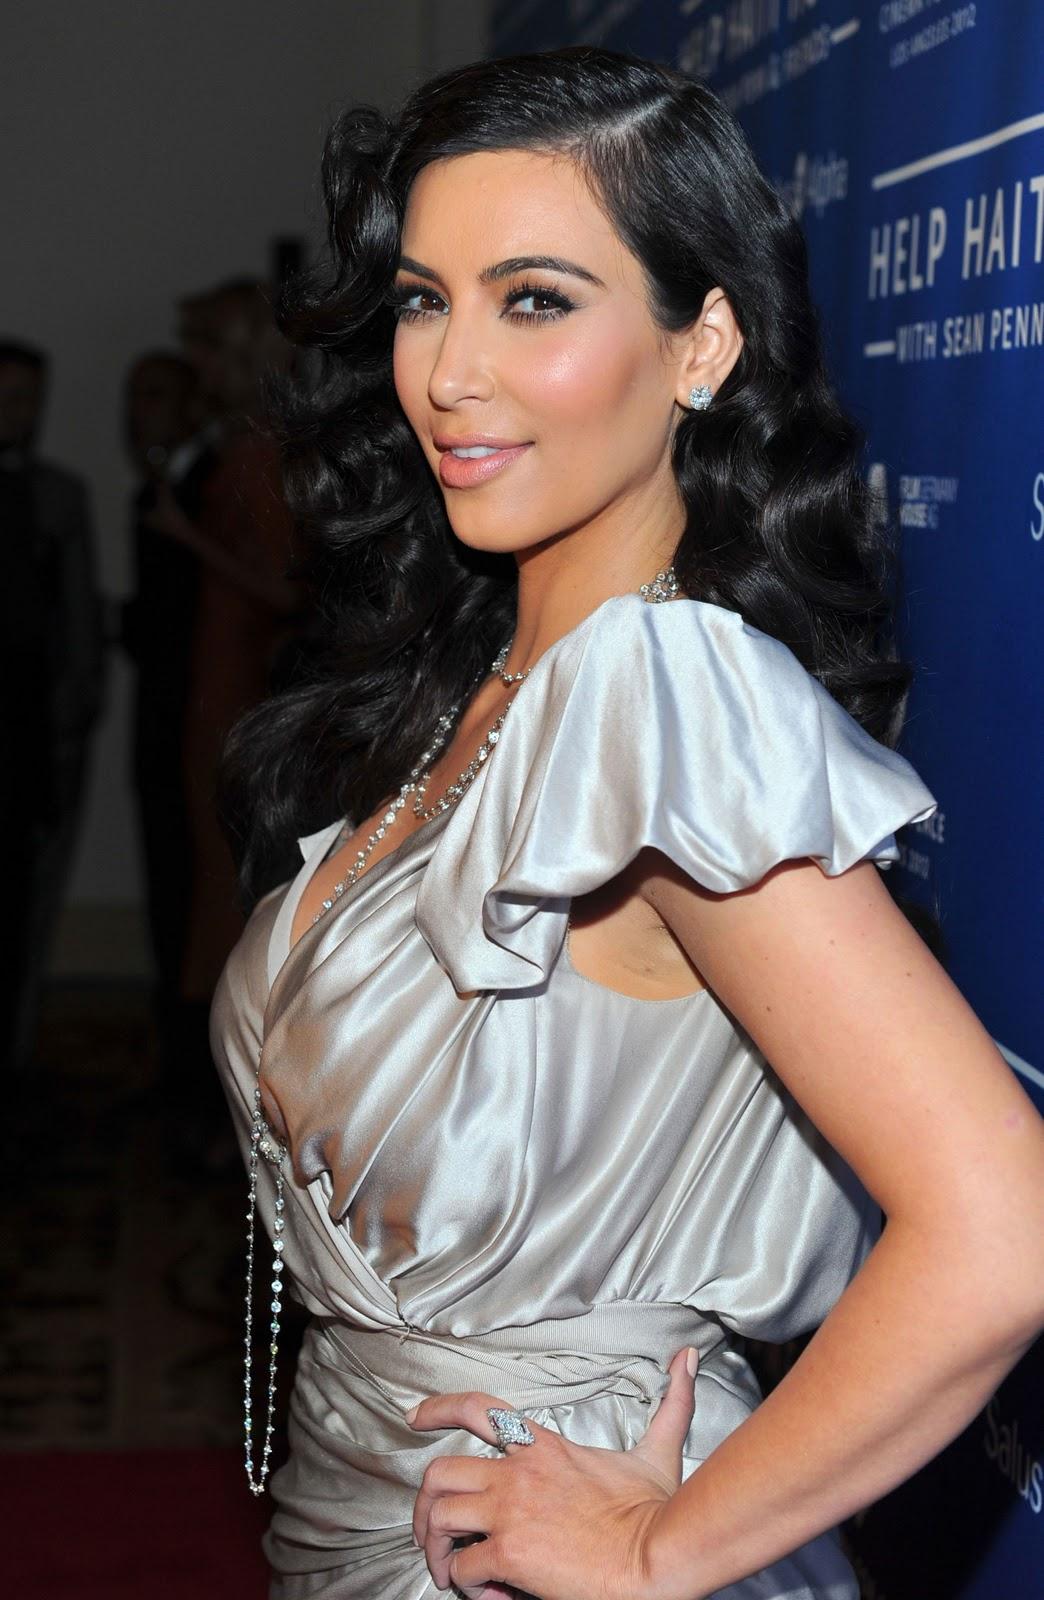 http://3.bp.blogspot.com/-dmNslw1m1Lw/TxP9CrTCQ7I/AAAAAAAAFwo/cPiaackMOCg/s1600/Kim-Kardashian+%25282%2529.jpg